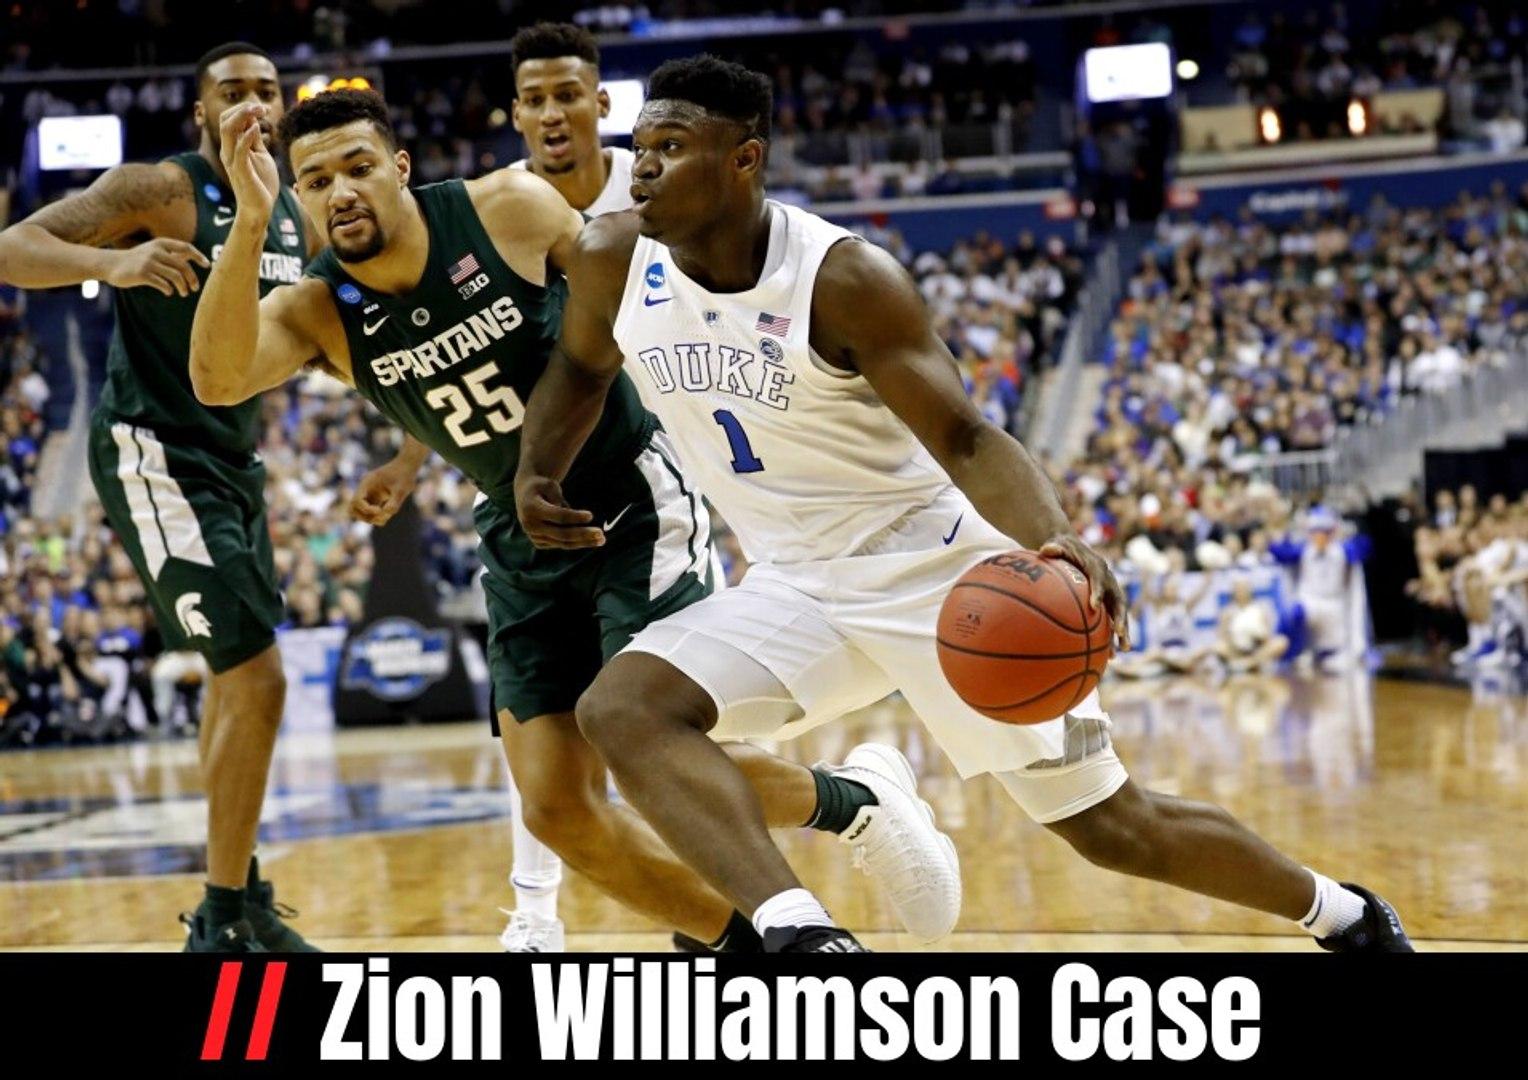 Zion Williamson Case Video Dailymotion